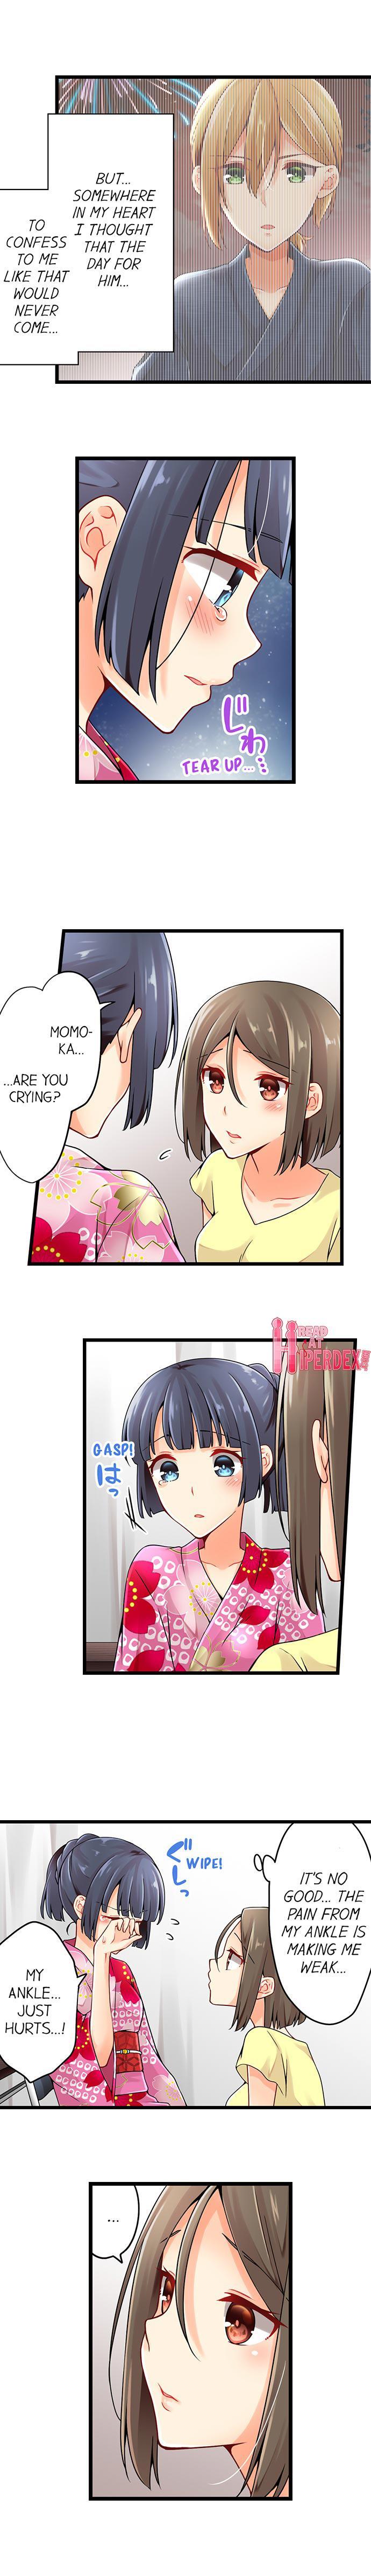 Ren Arisugawa Is Actually A Girl 762